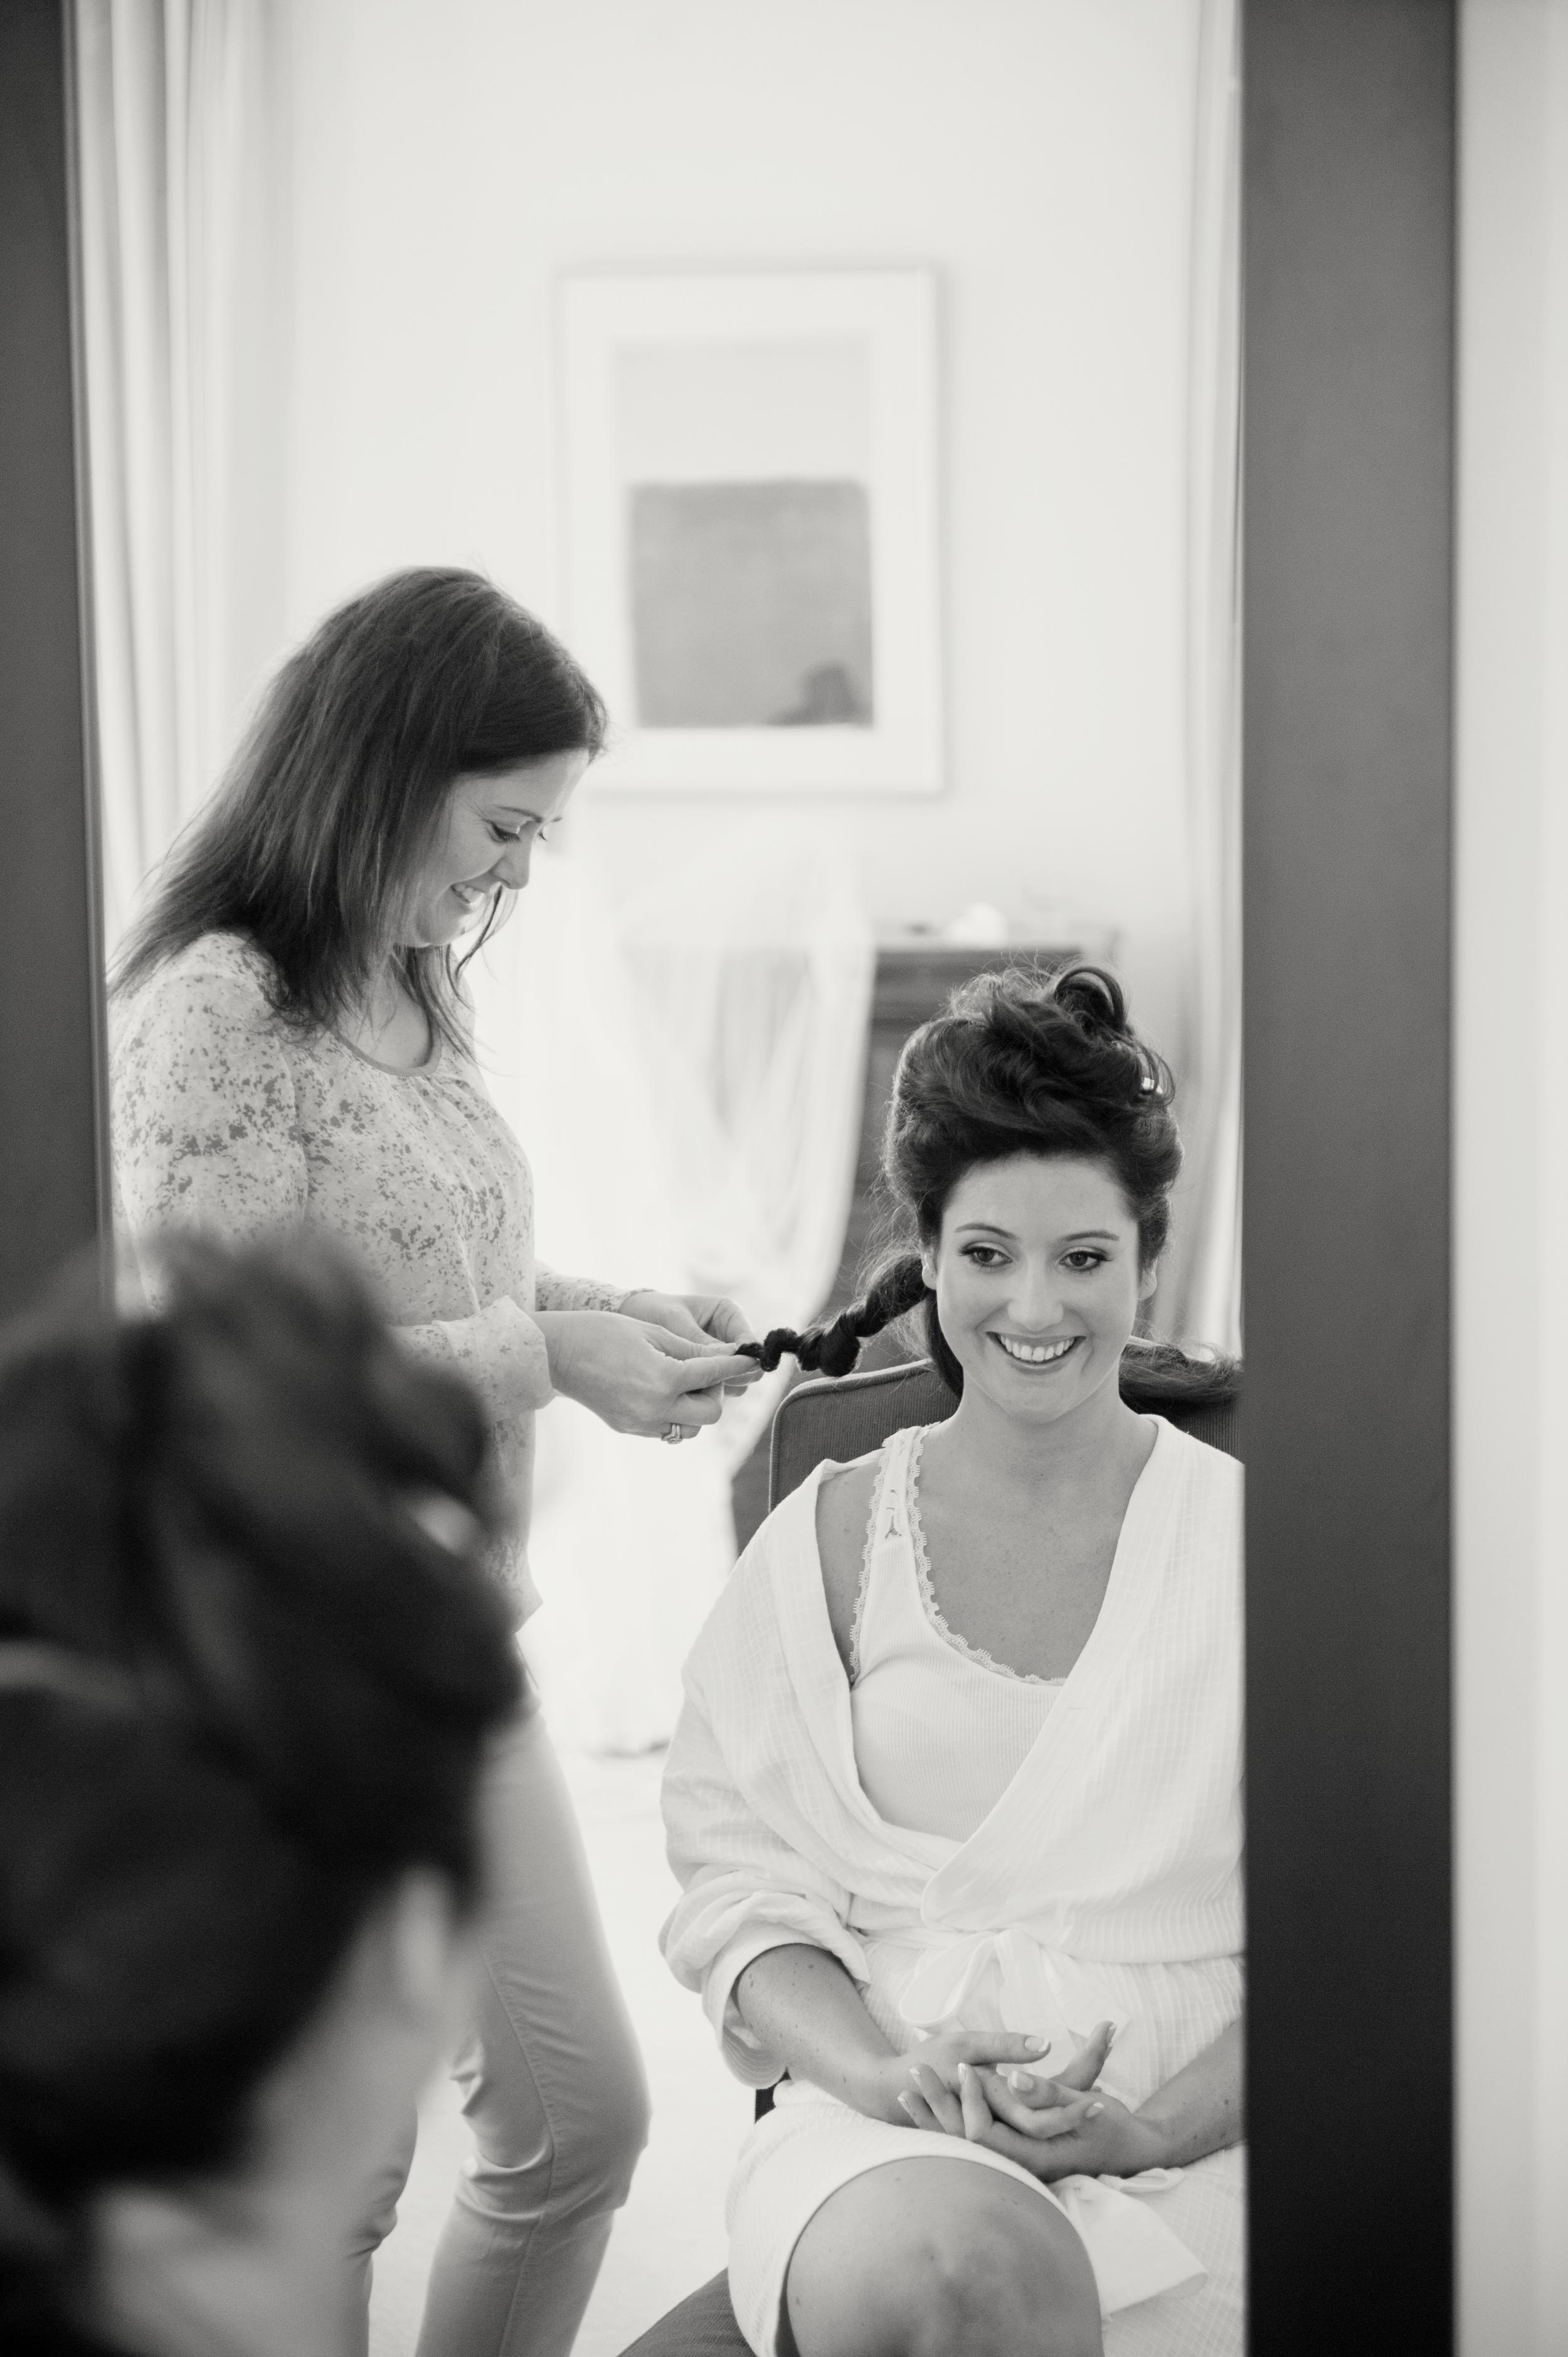 Hair by Marie Hickey - Photography:  Weddings by KARA  © - Wedding Location: Kilshane House, Tipperary, Ireland